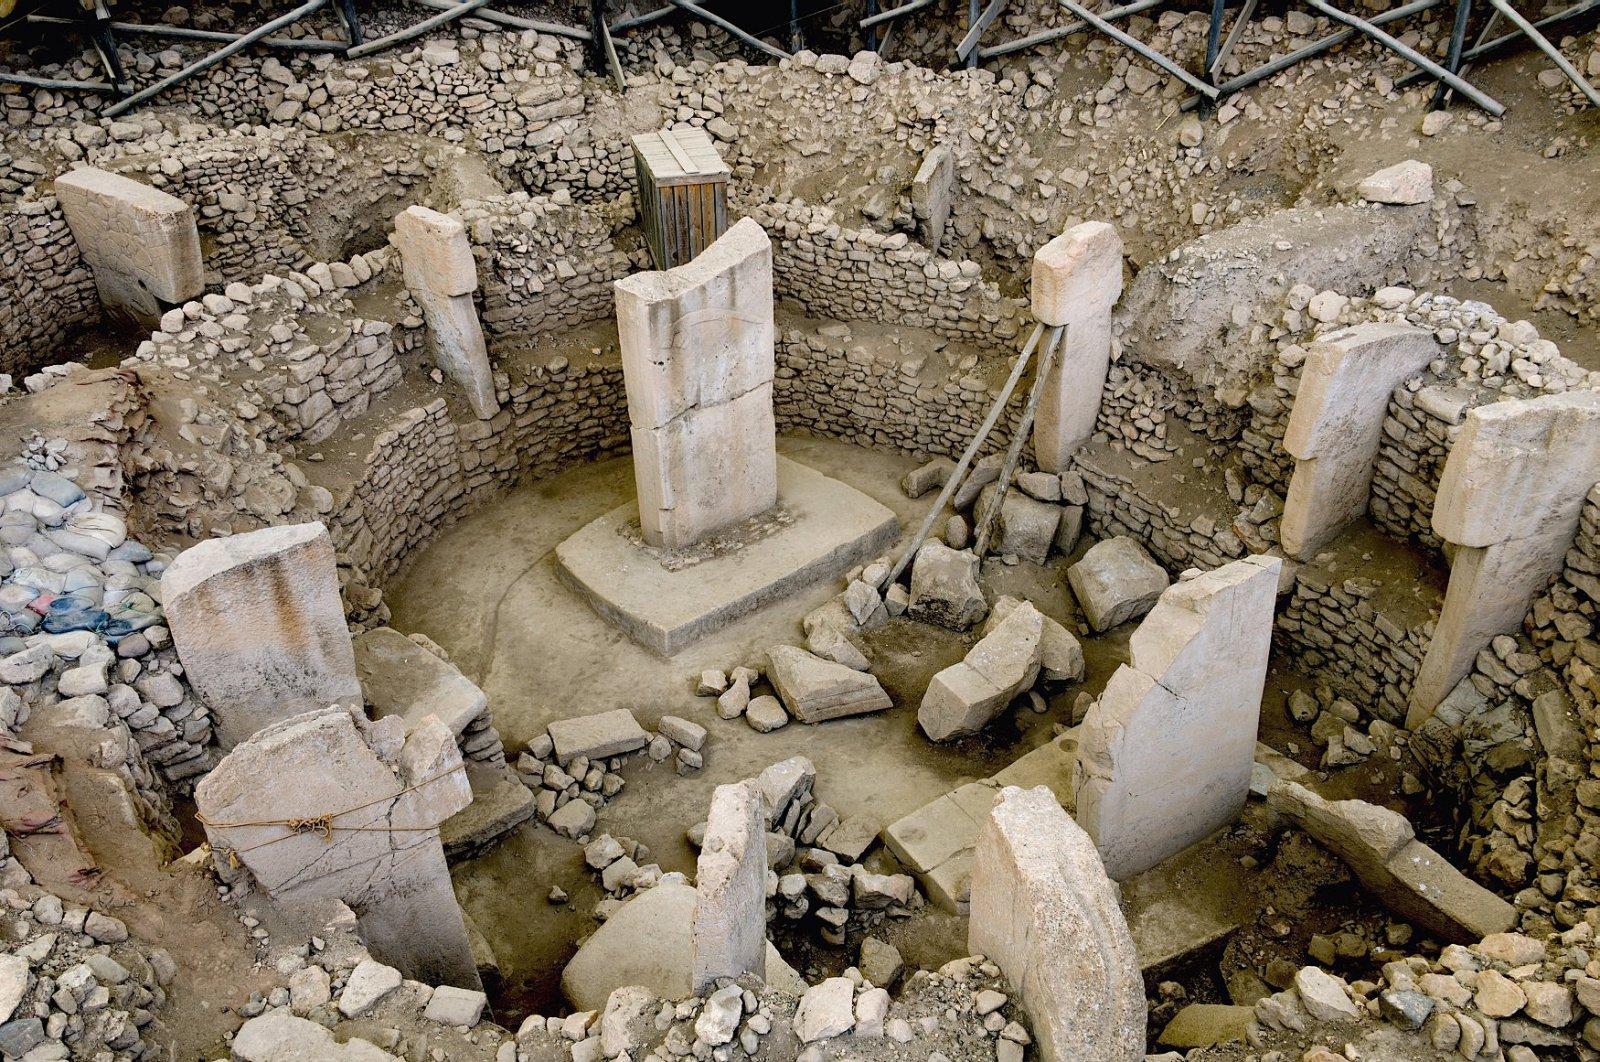 The ancient site of Göbeklitepe is seen in this undated photo, Şanlıurfa, Turkey.